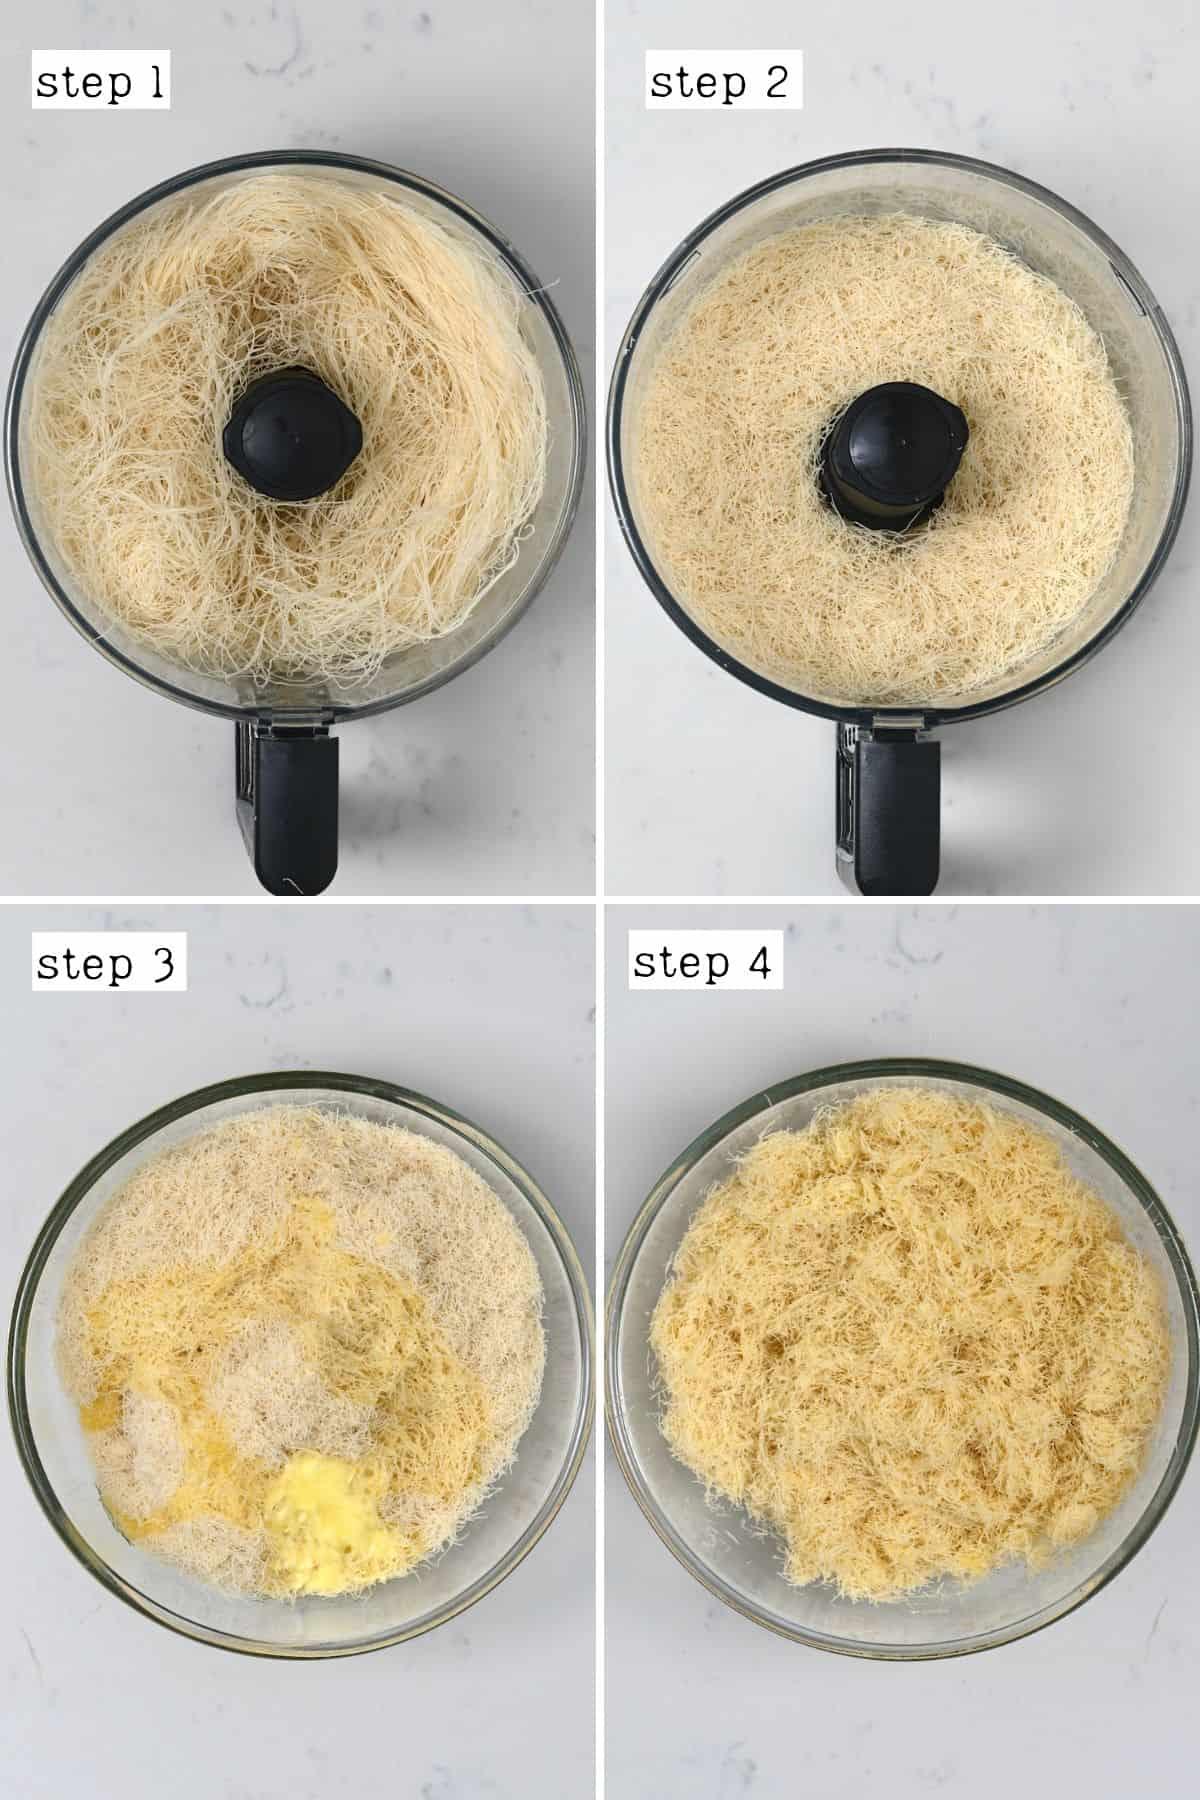 Steps for preparing kataifi dough